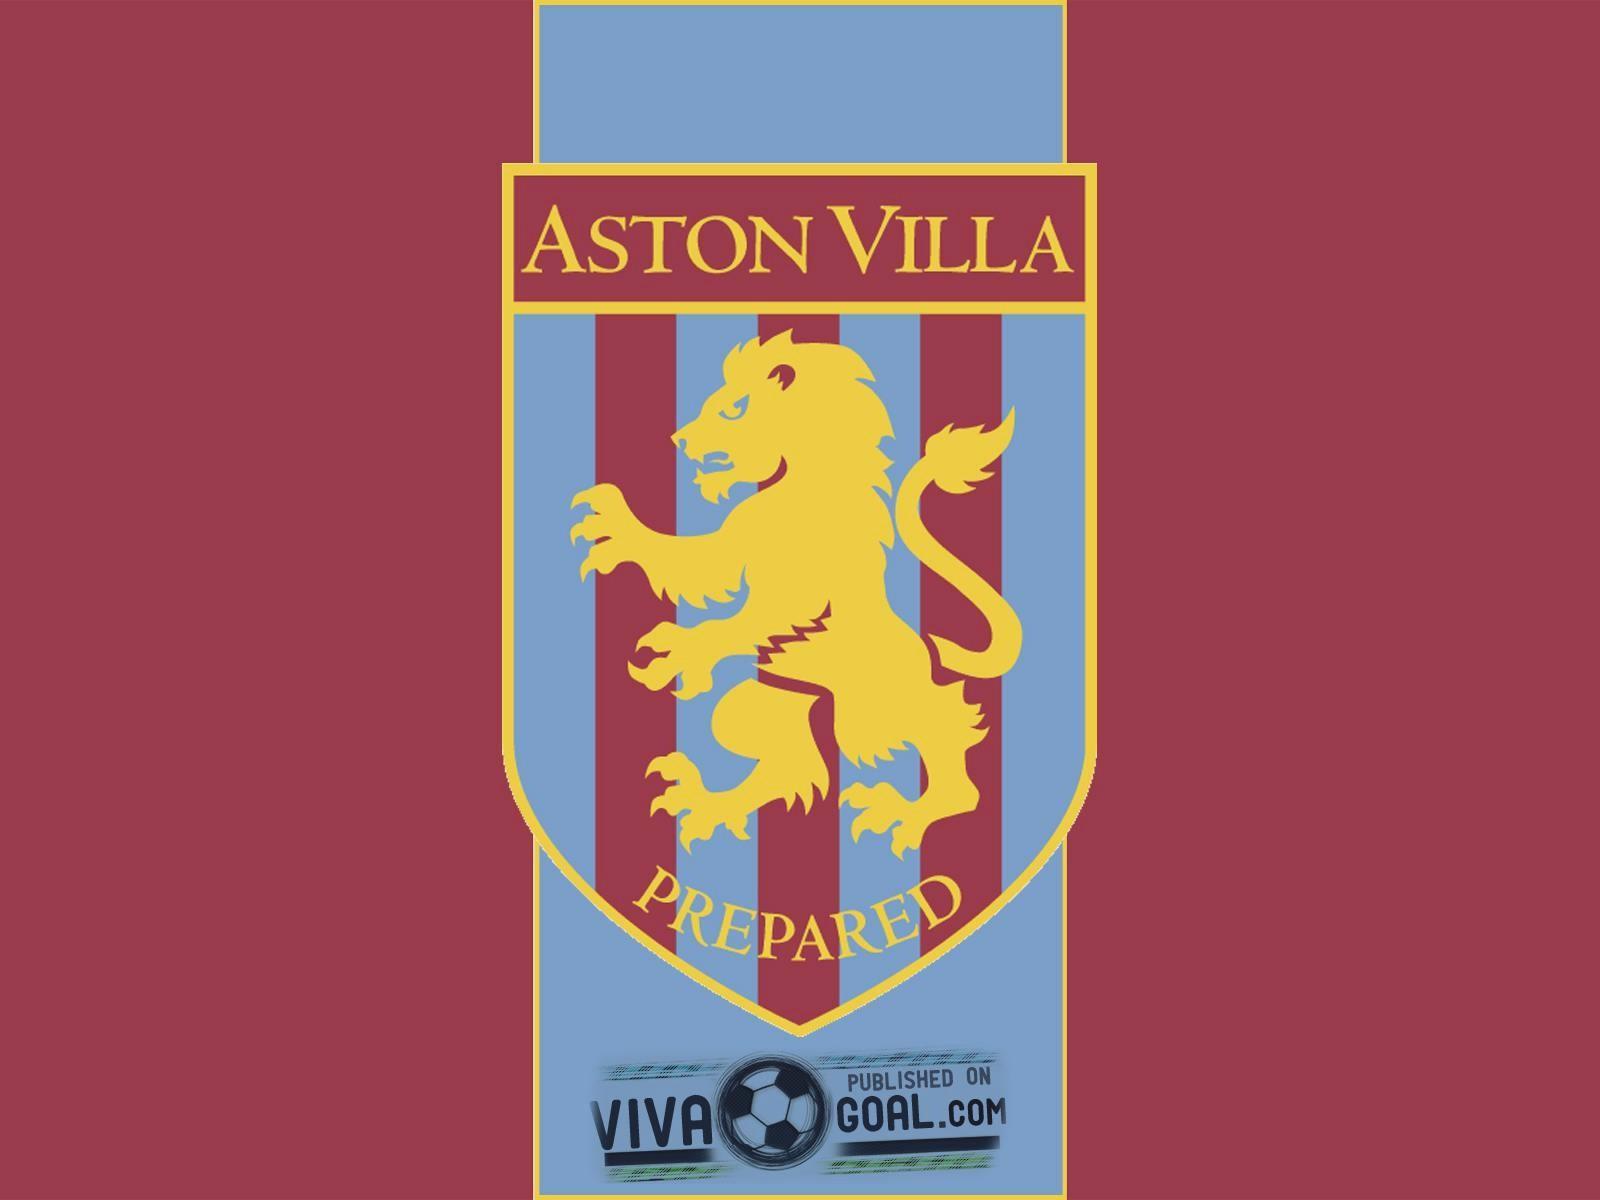 aston villa fc wallpaper hd download